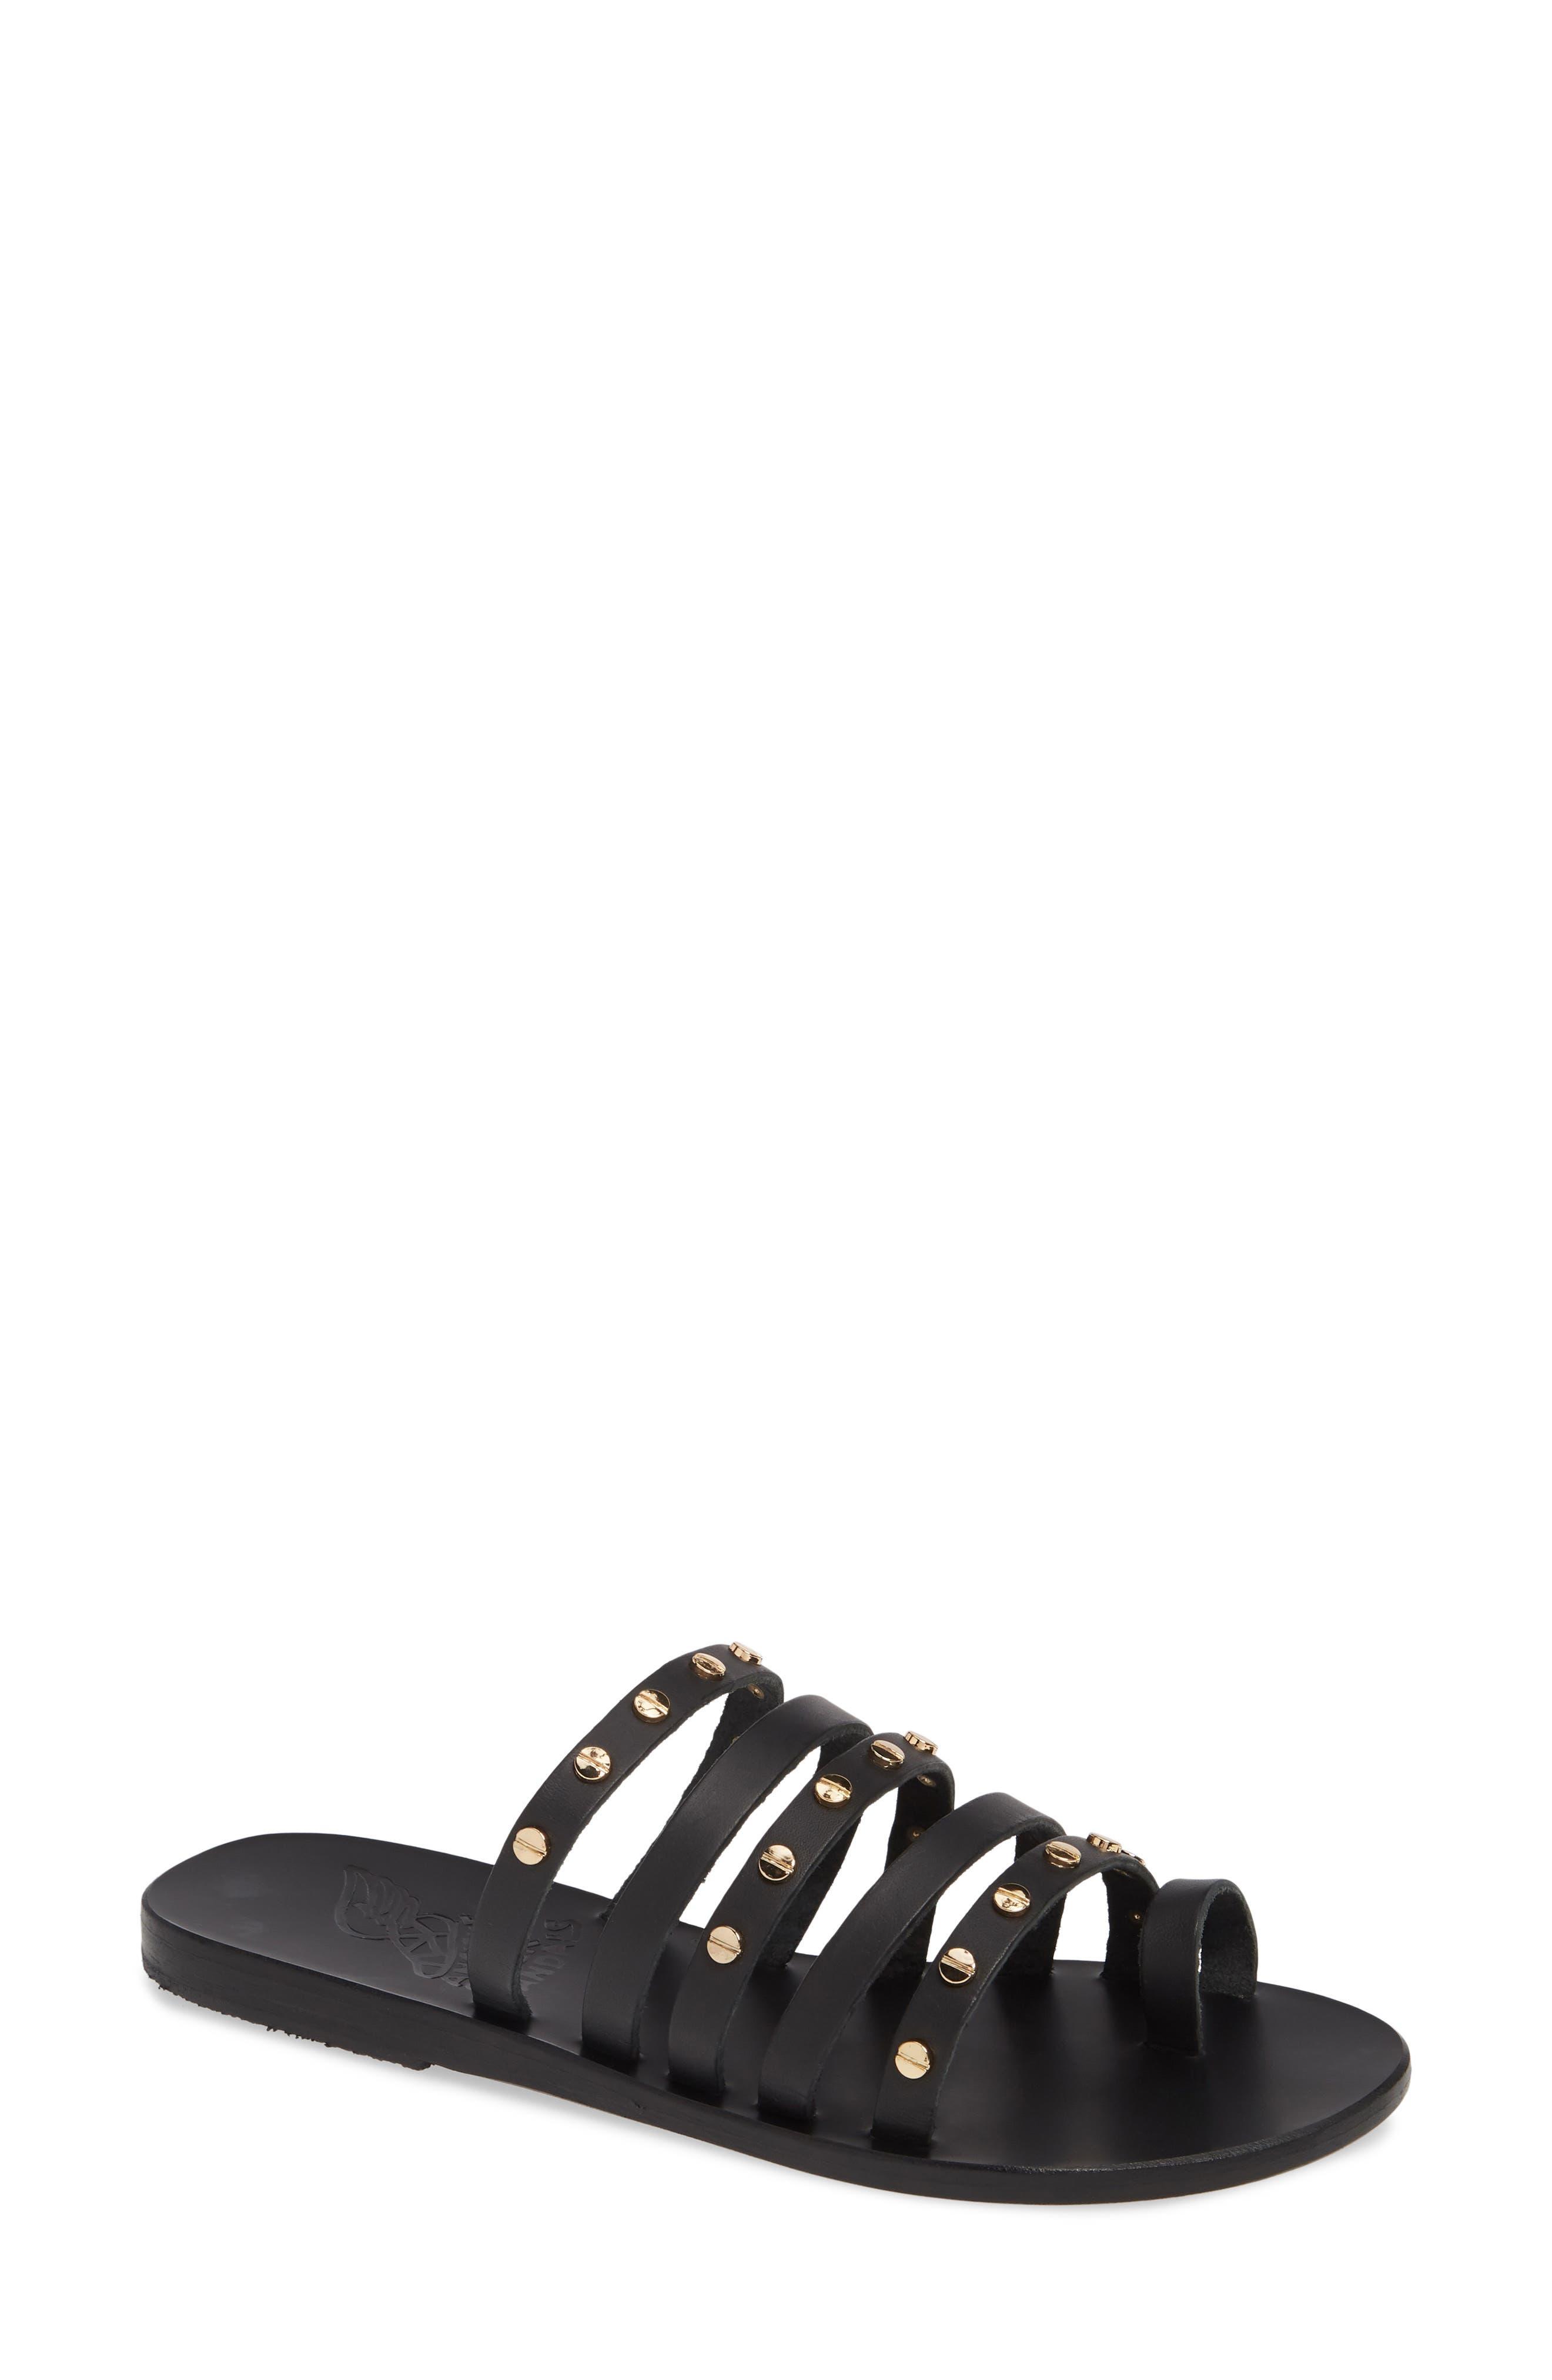 ANCIENT GREEK SANDALS Niki Nails Sandal, Main, color, BLACK